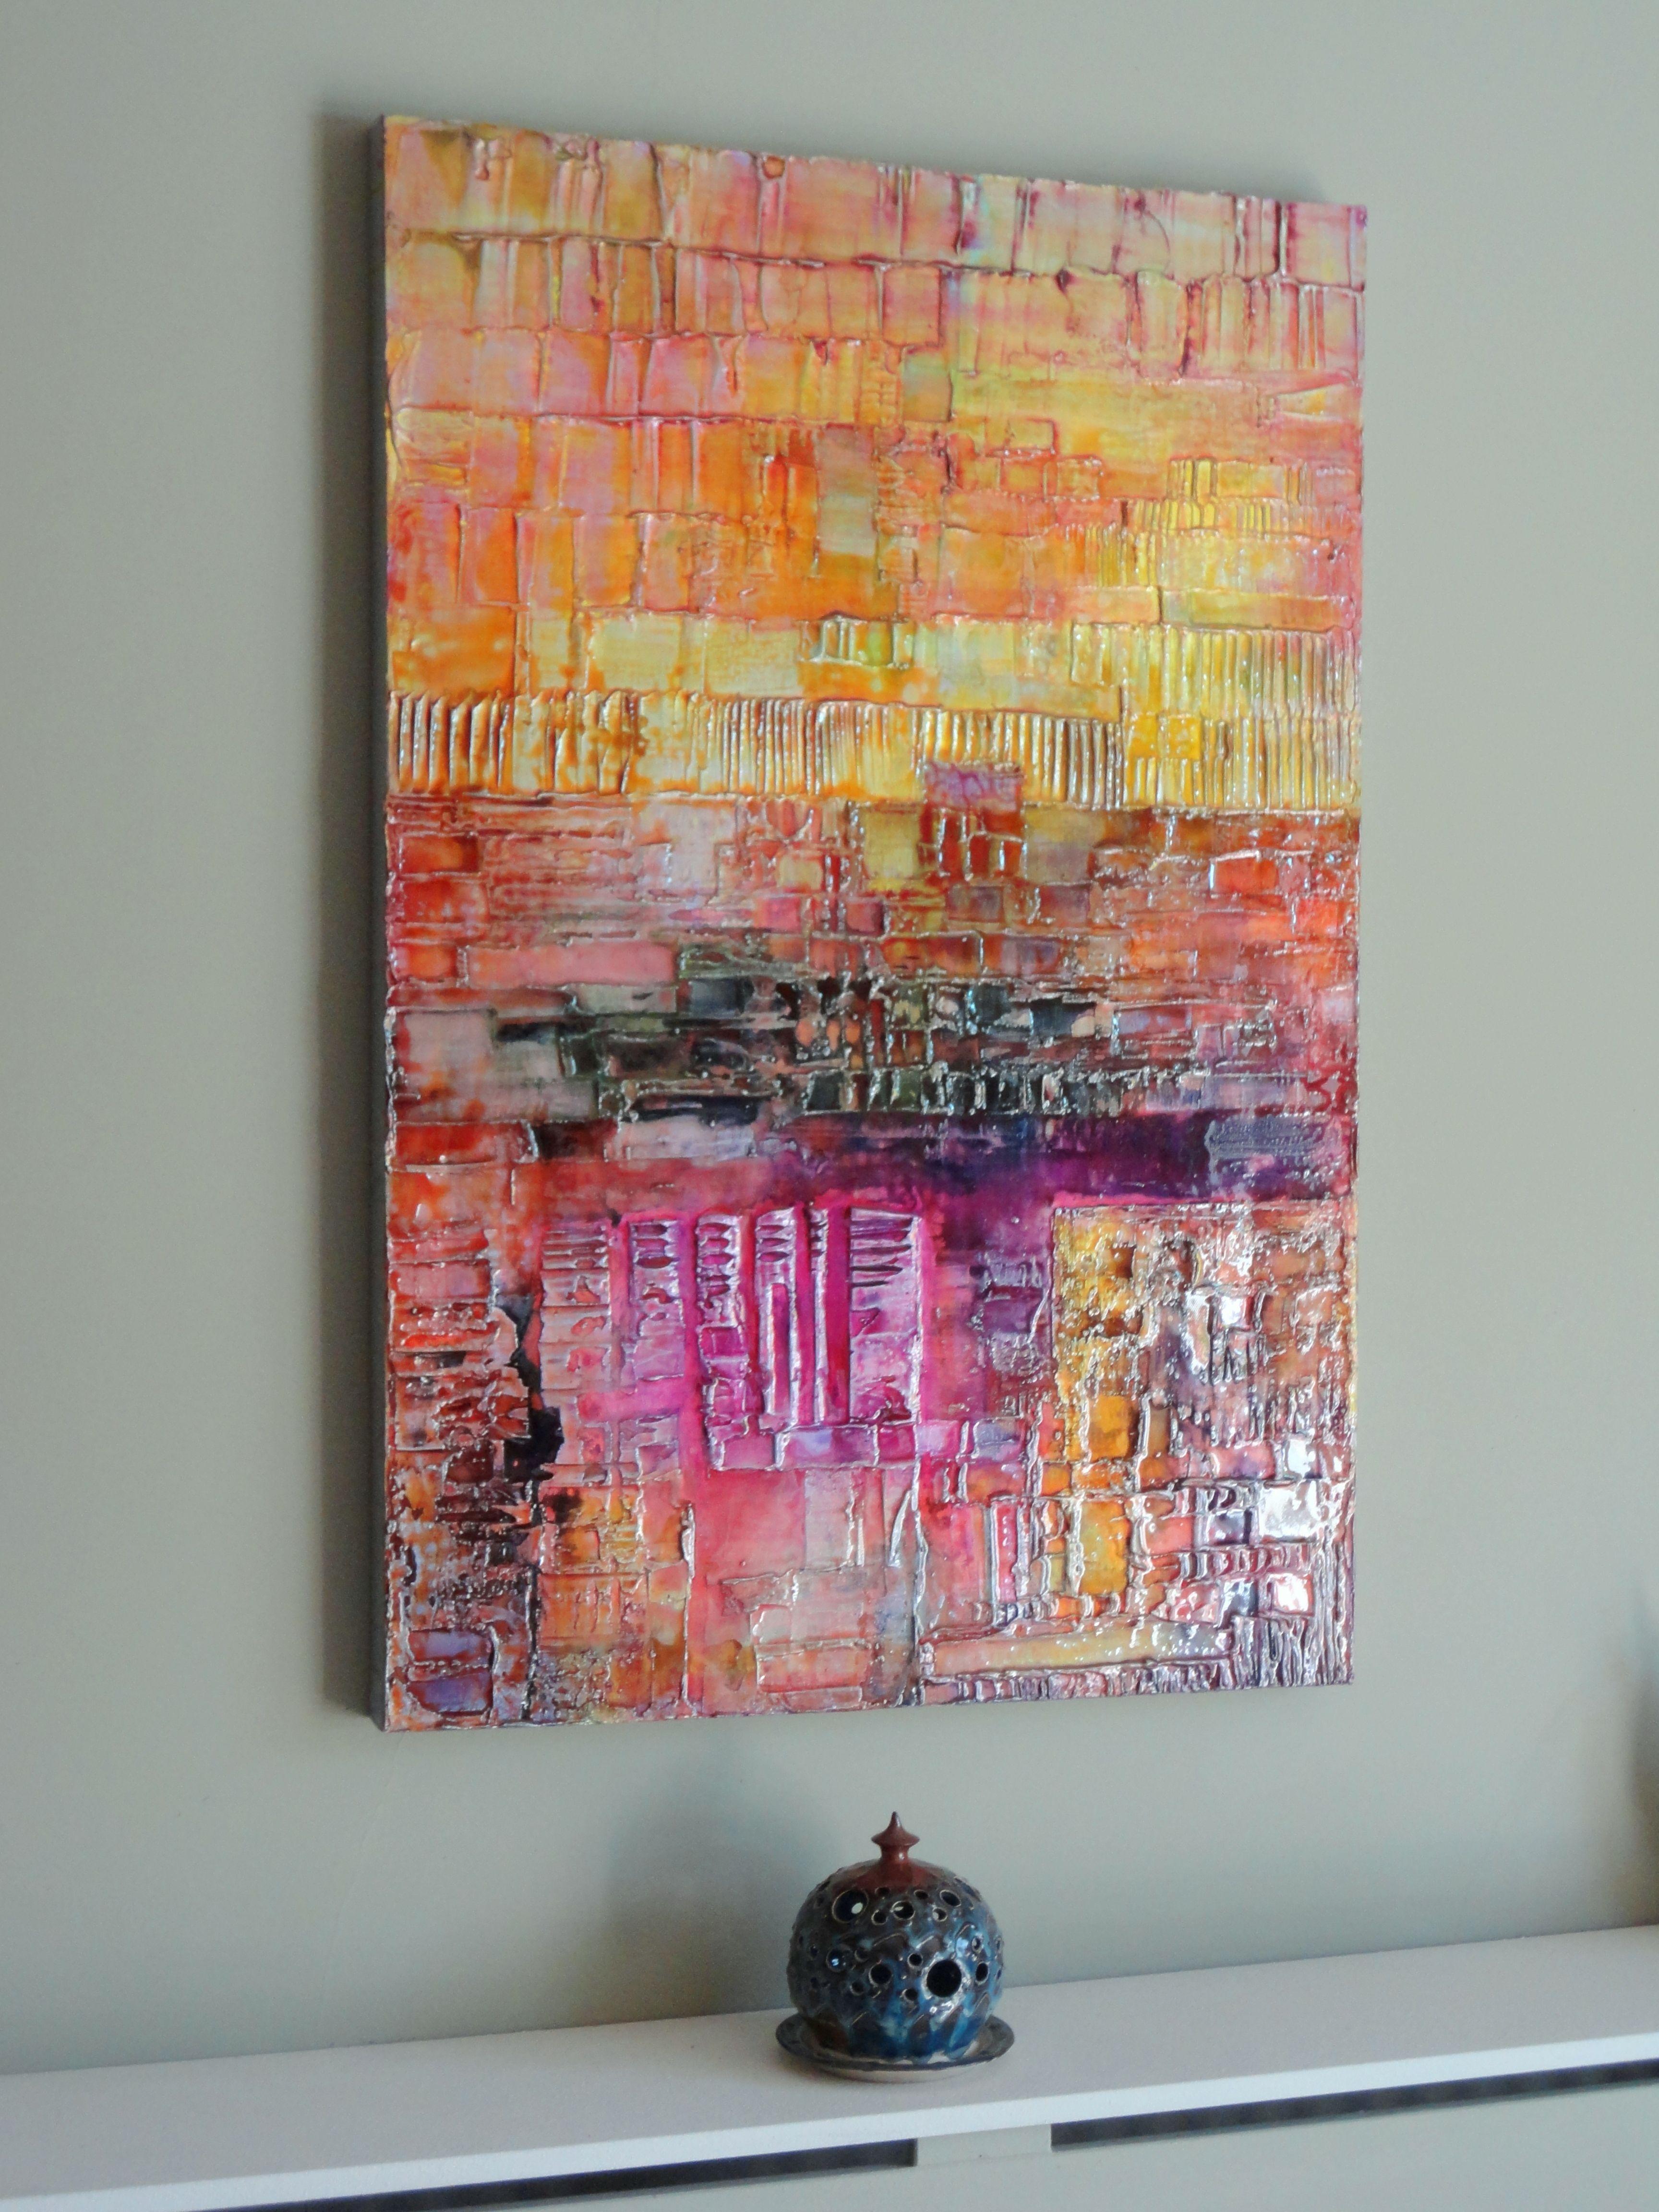 Tecniche Di Imbiancatura Moderna abstract art by paul mason   arte astratta, astratto, dipinti